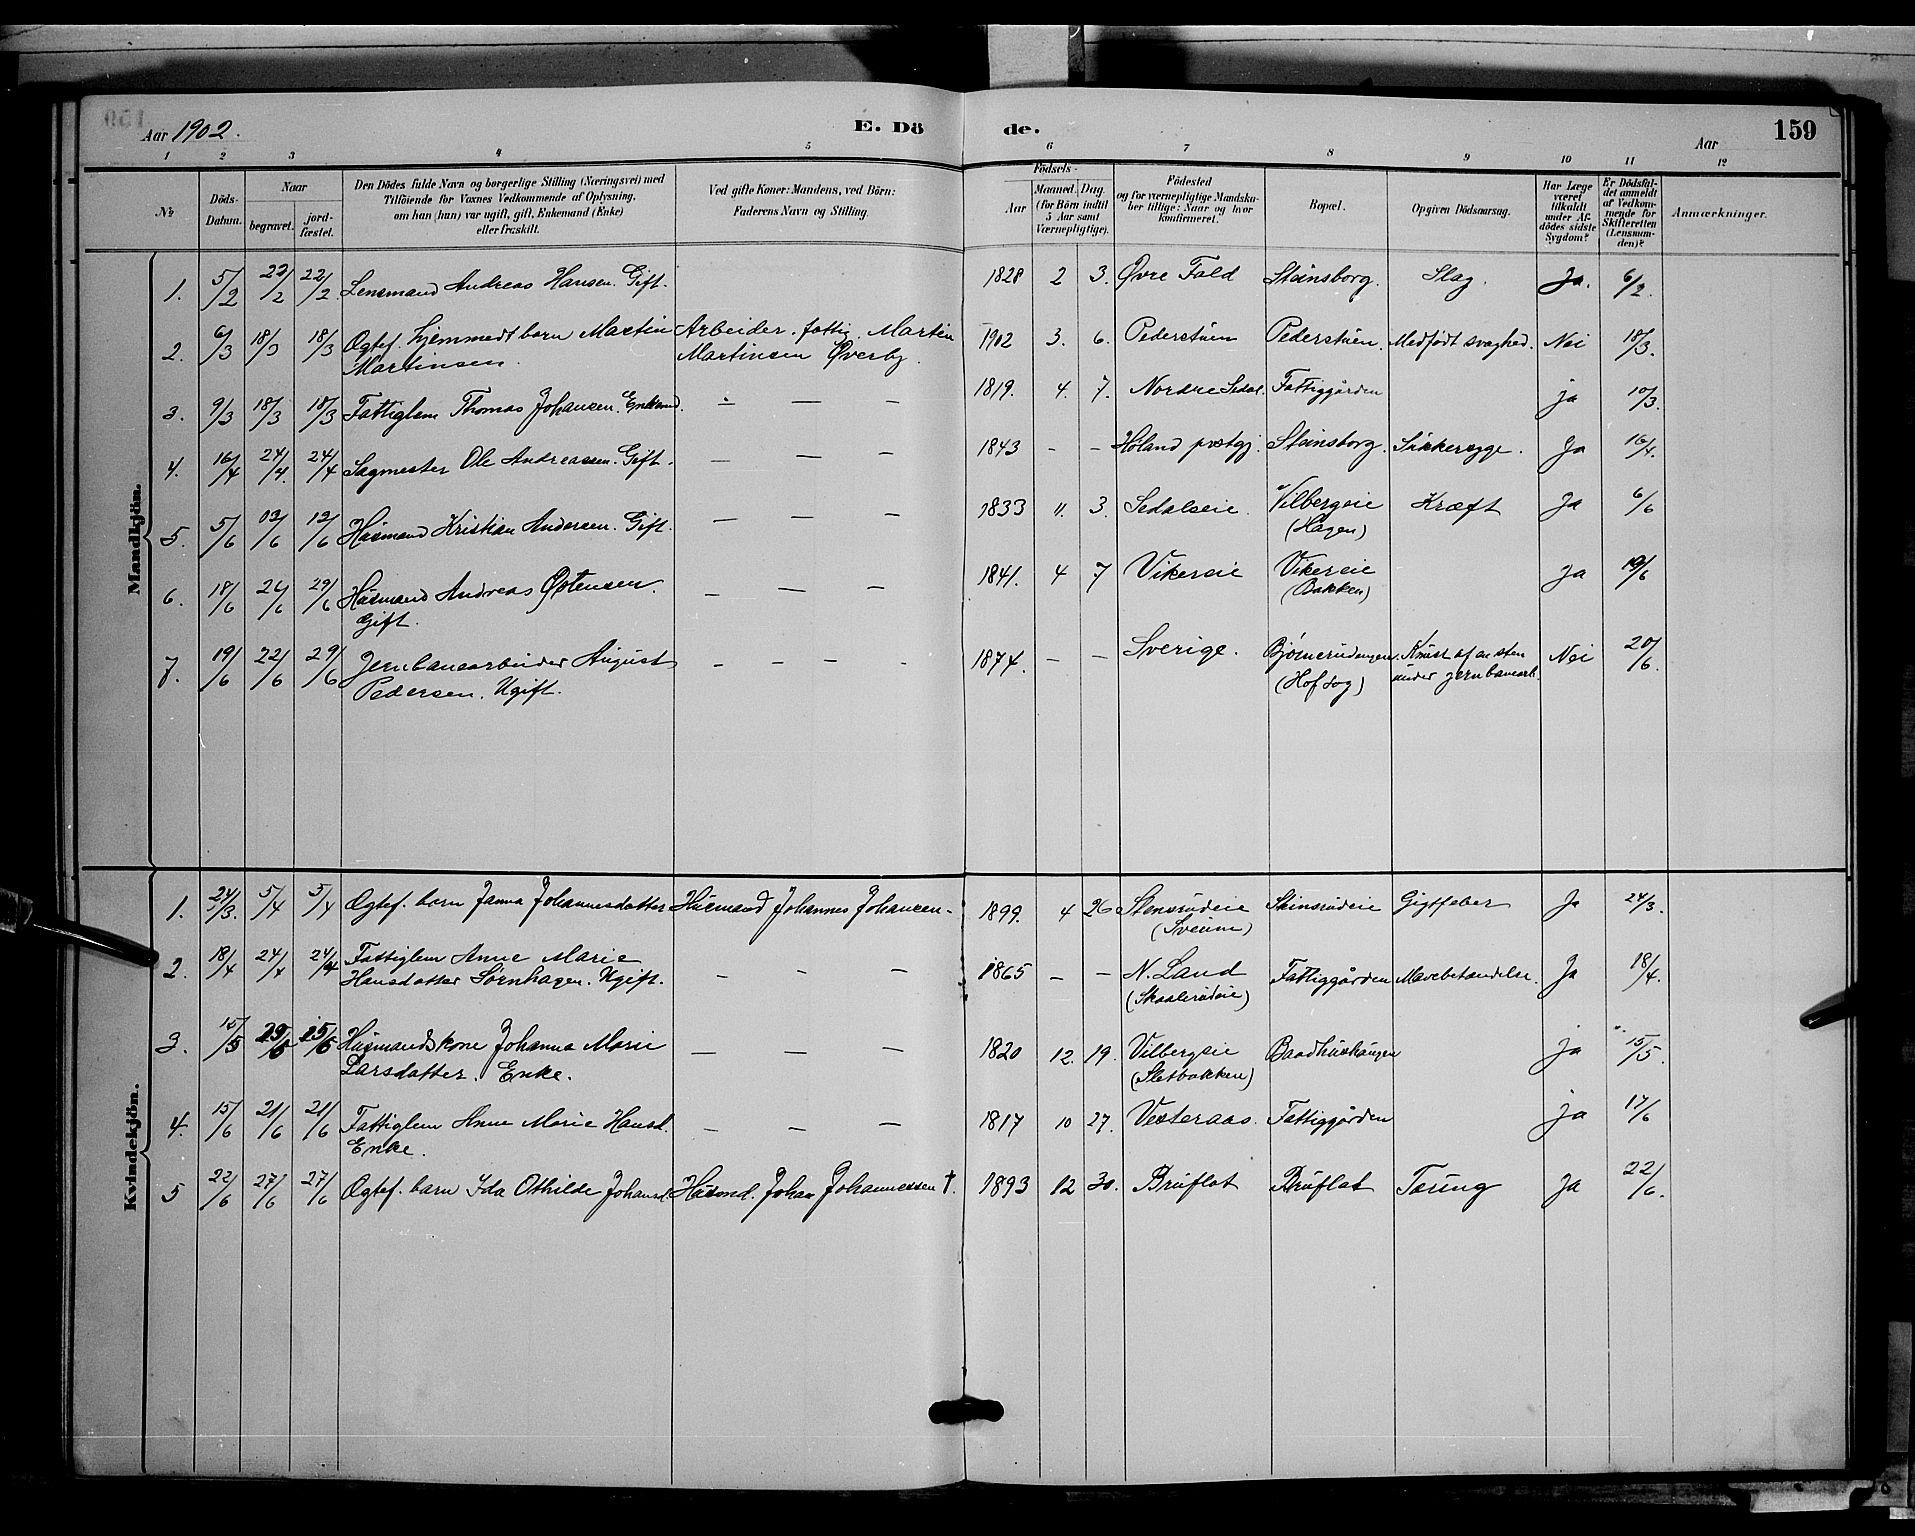 SAH, Søndre Land prestekontor, L/L0003: Klokkerbok nr. 3, 1884-1902, s. 159